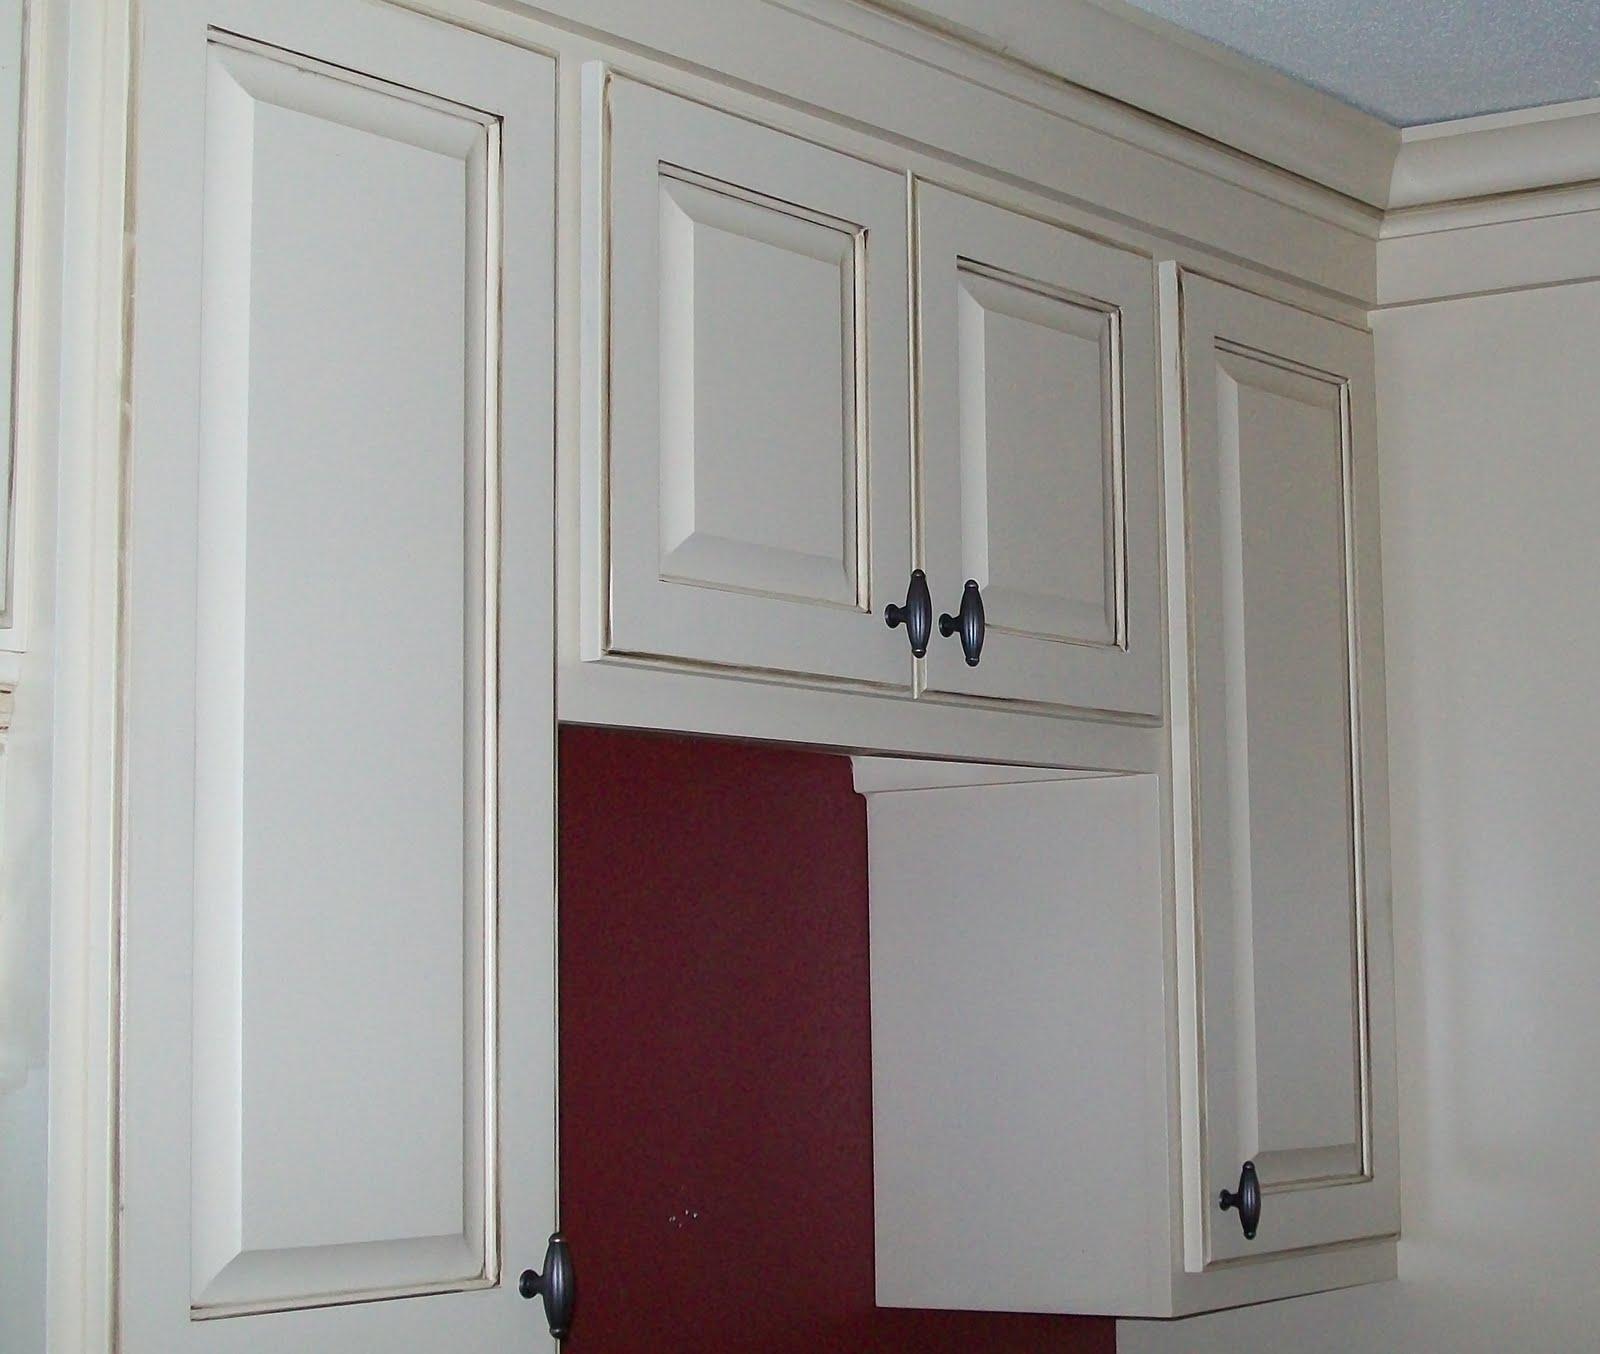 LWi Custom Cabinets: Glazed cabinets- the newest way